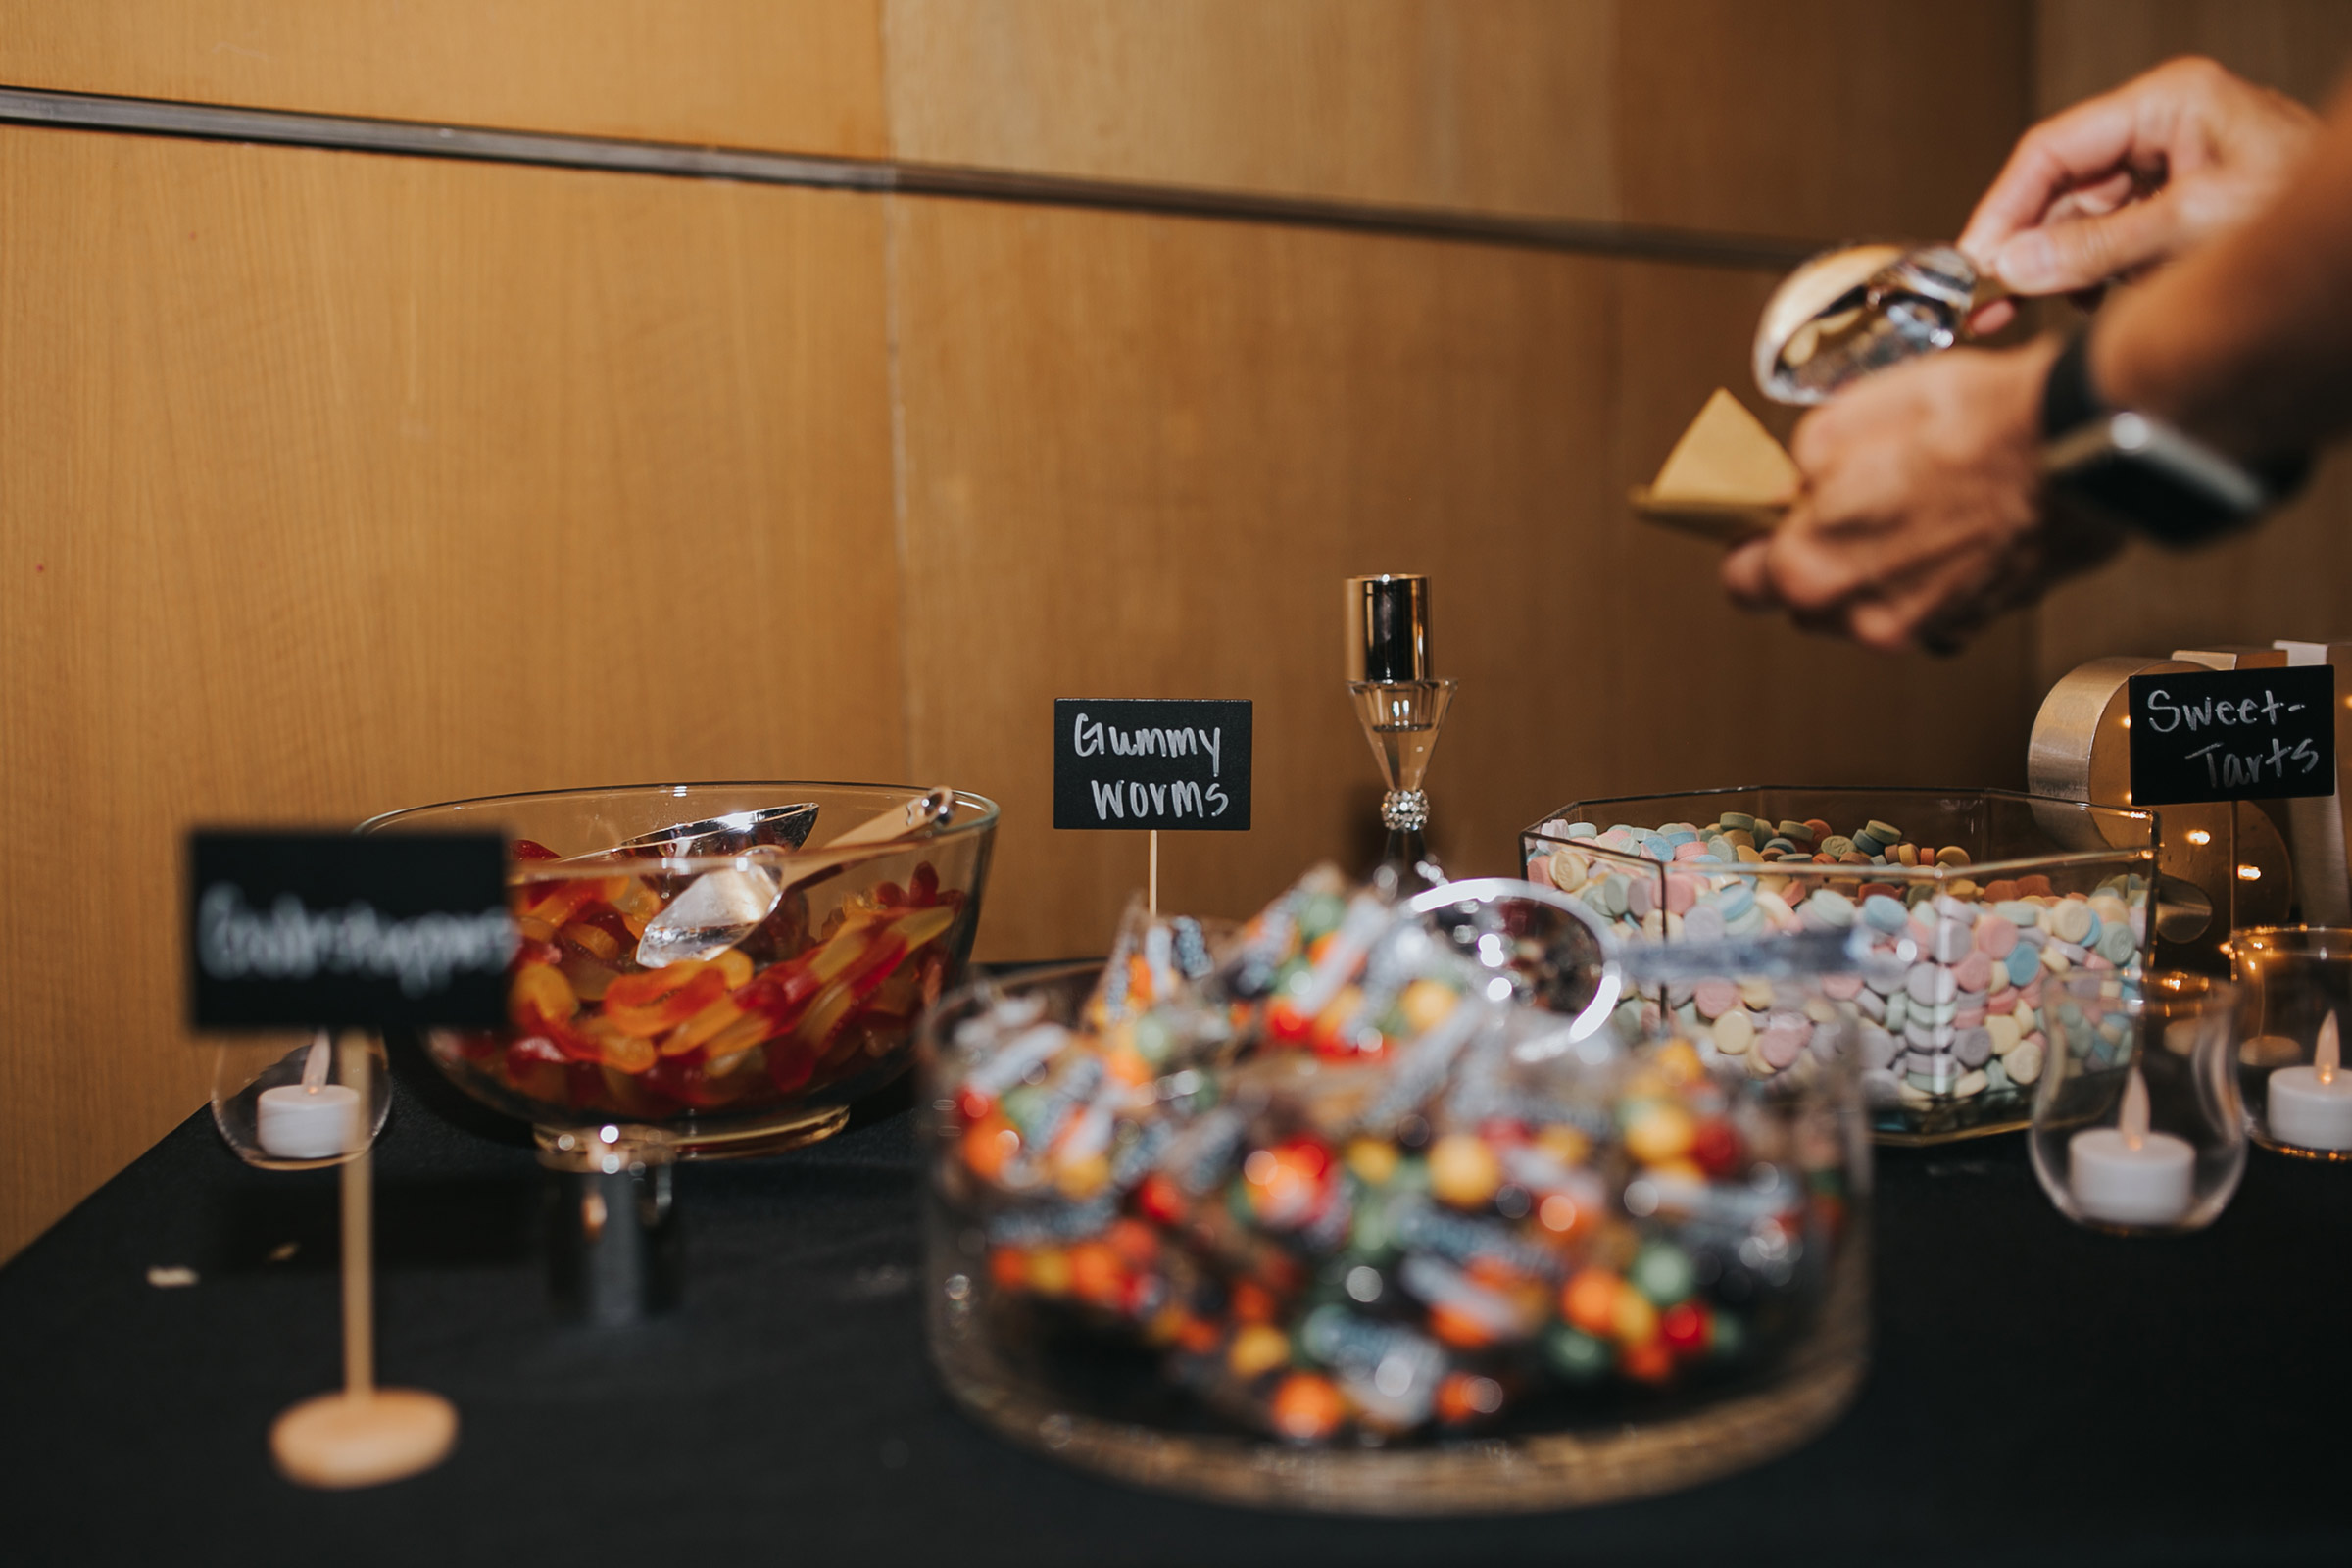 candy-bar-desmoines-iowa-art-center-raelyn-ramey-photography.jpg